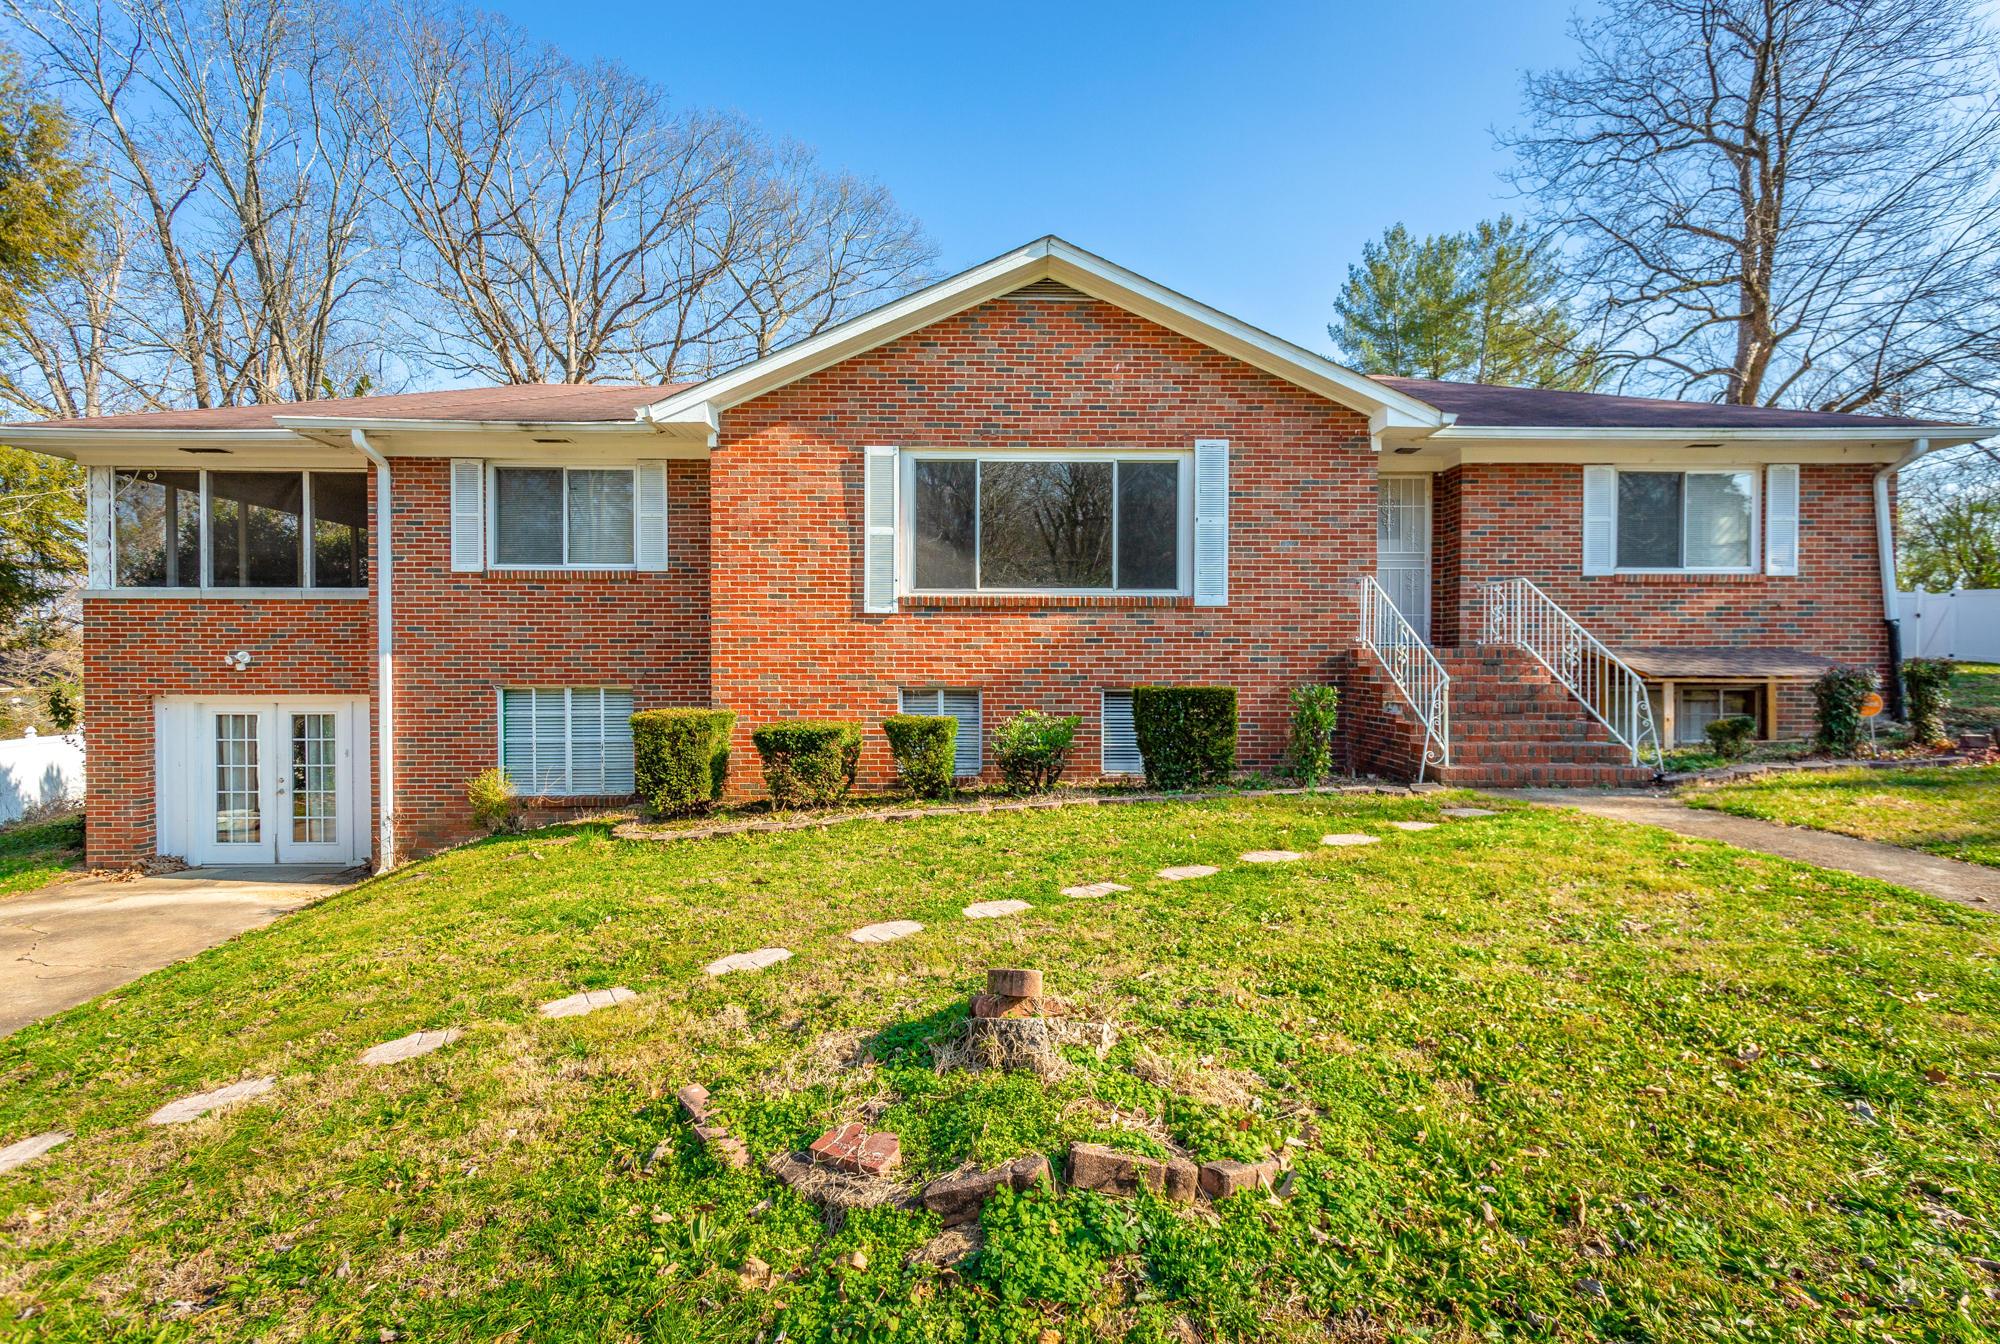 410 Talley Rd, Chattanooga, TN 37411